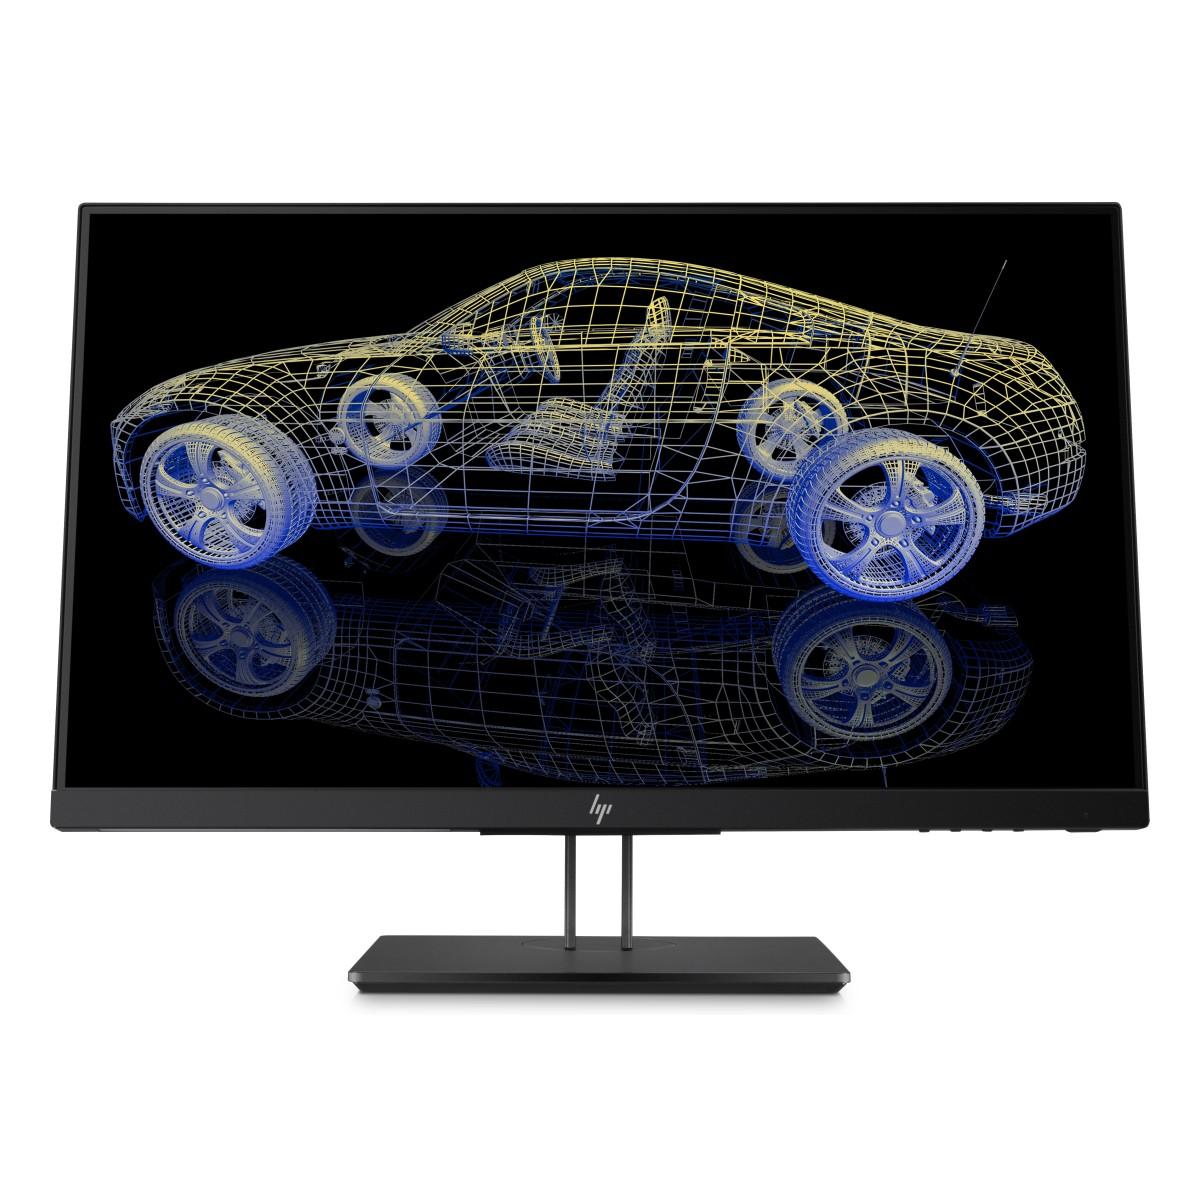 HP Z23n 23'' G2 1920x1080/250/1K:1/DP/HDMI/VGA/7ms